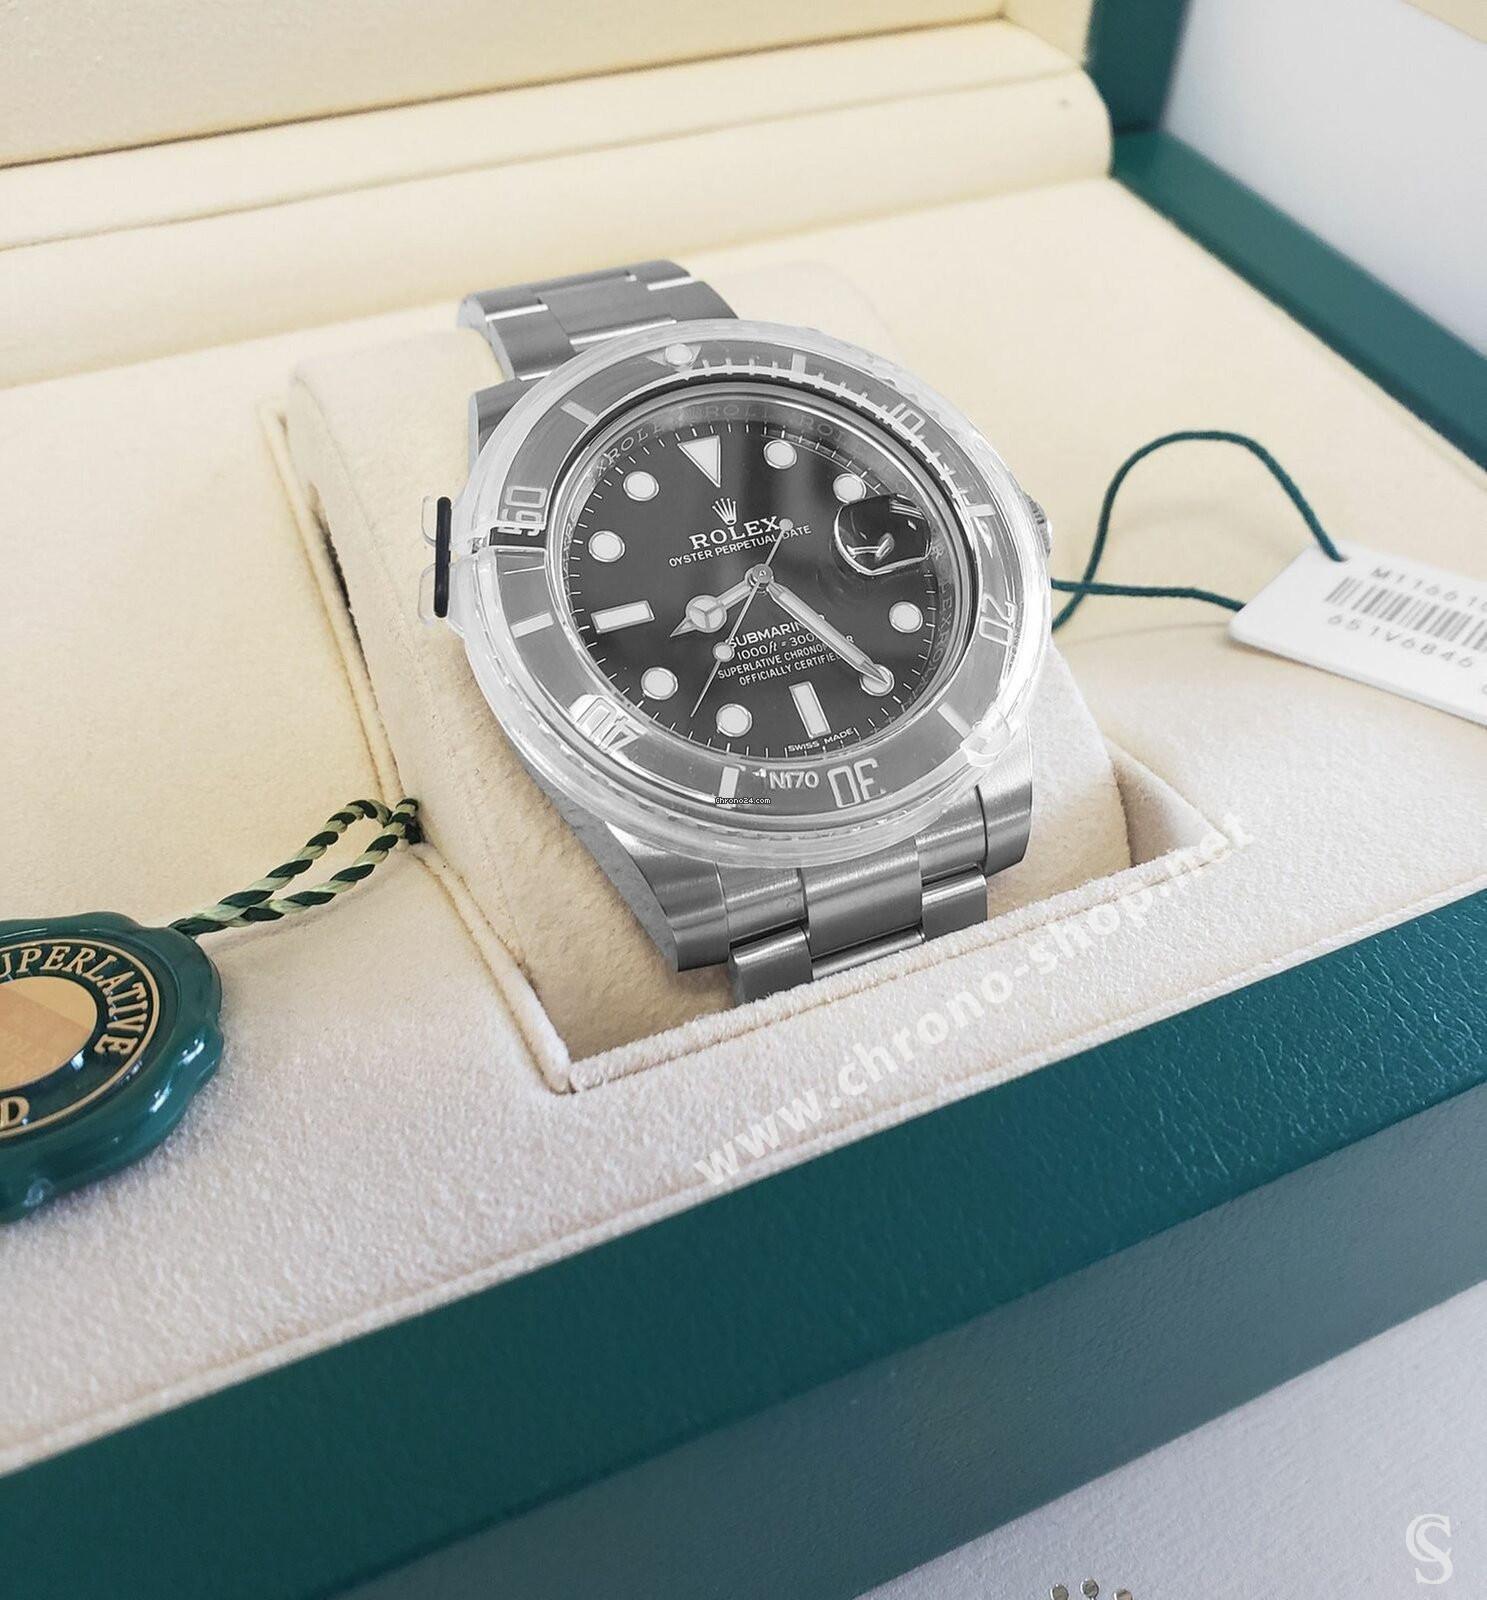 Rolex Watch Bezel Protector N170 Submariner 114060,116610,116613,116618,116619 Daytona 116500,GMT 116710,116713,116718